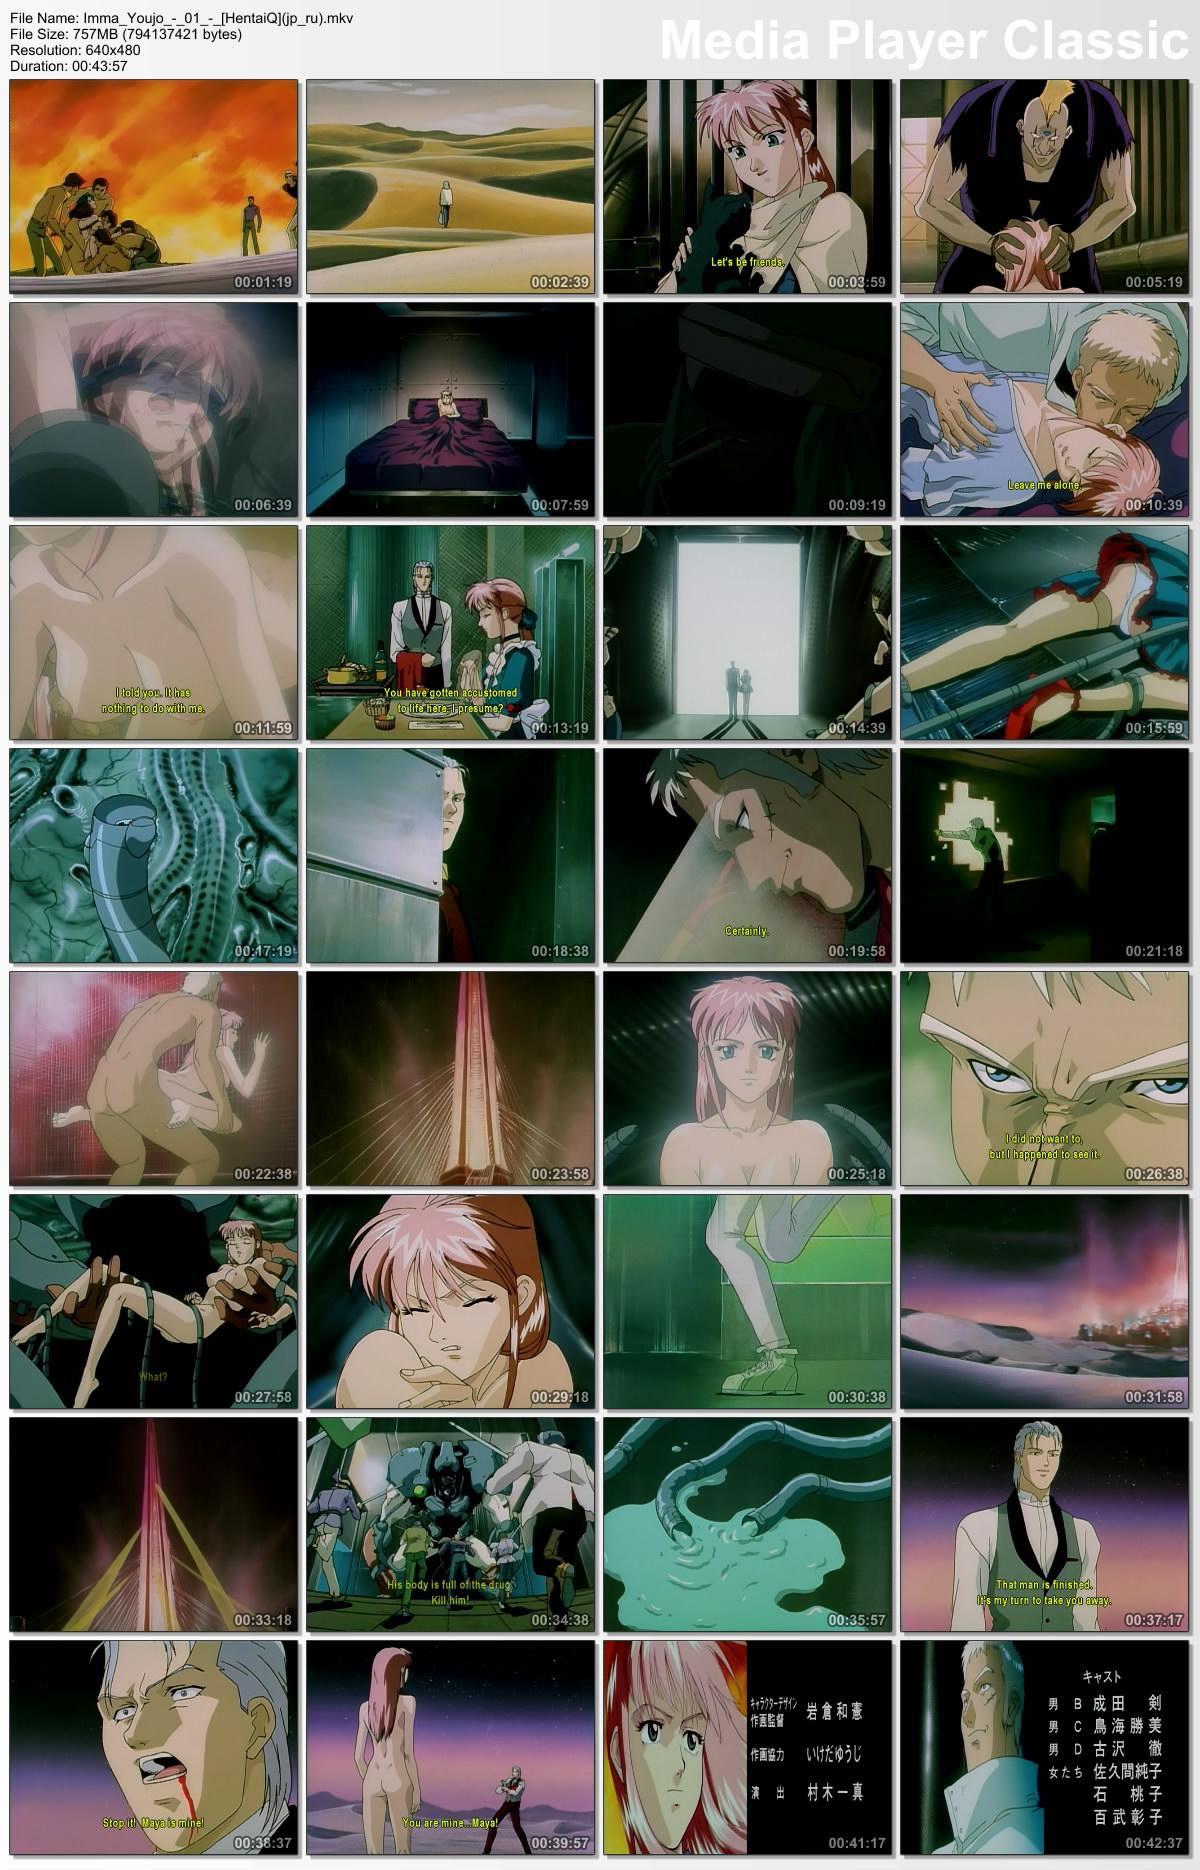 Imma Youjo: The Erotic Temptress / Ведьма-развратница / Соблазнительница [5 из 5] [RUS,ENG,JAP] Anime Hentai